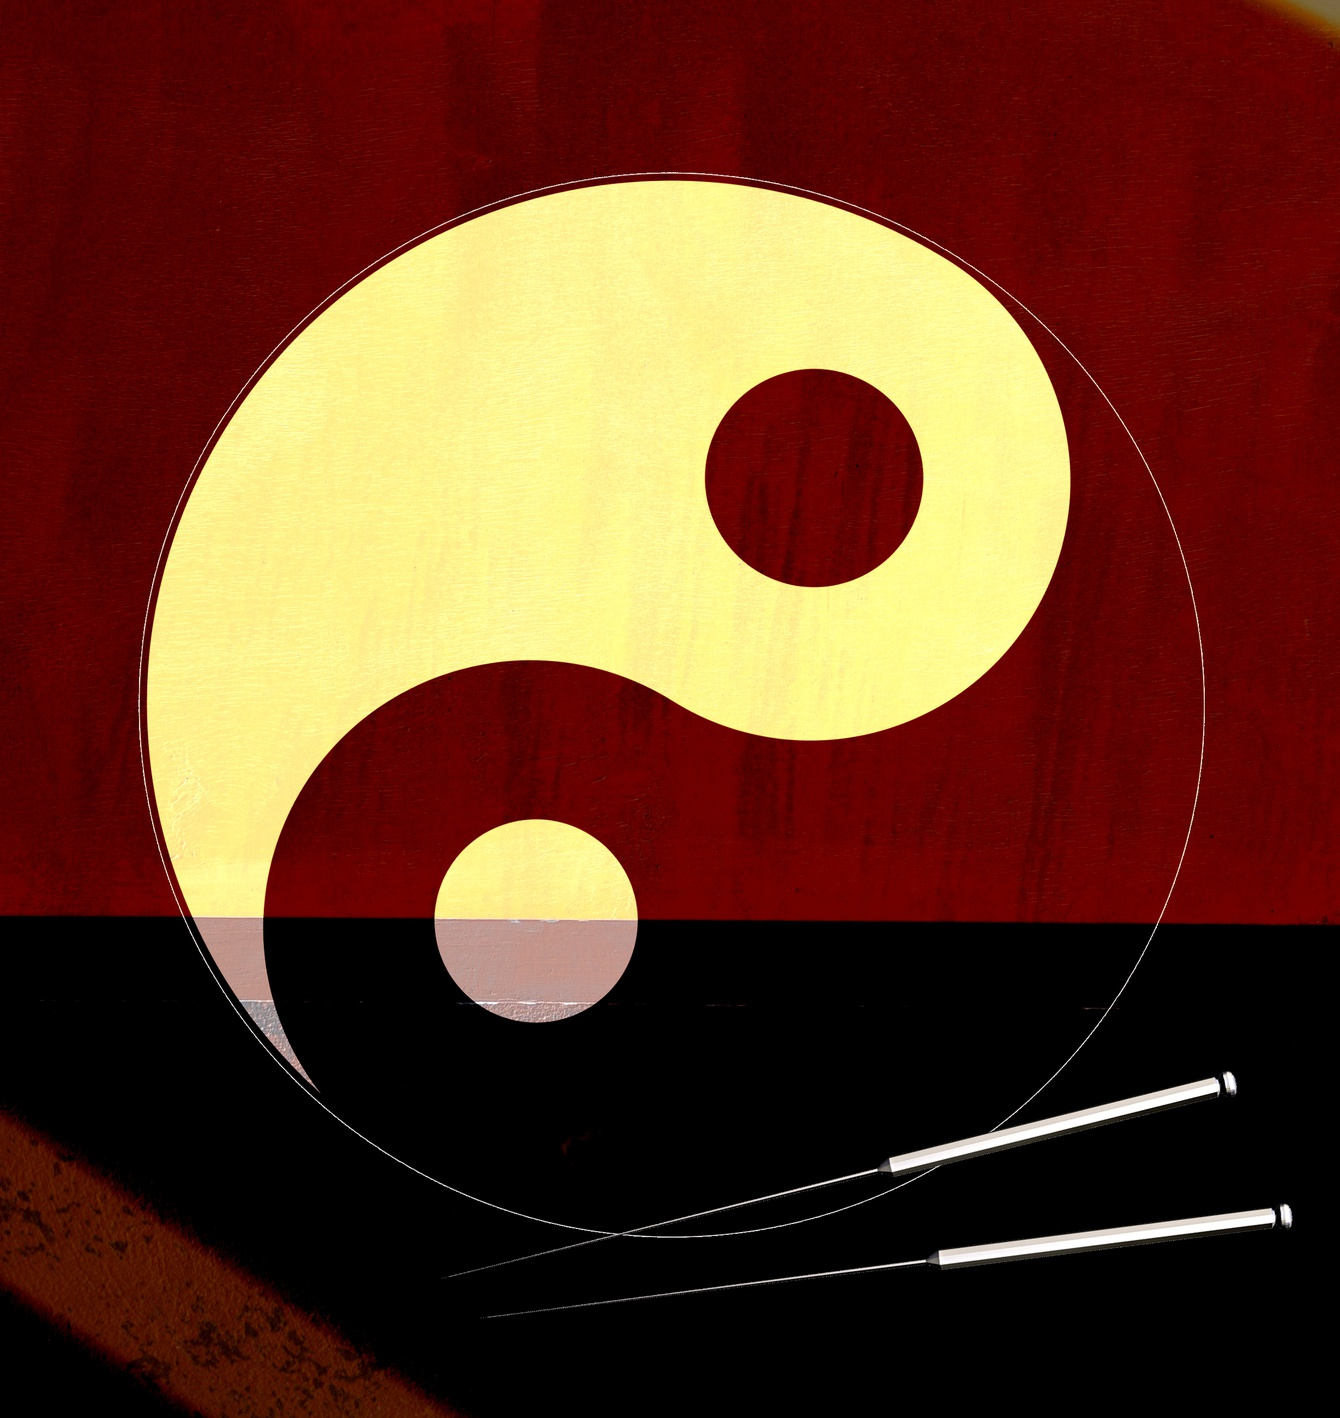 BronzeYinyang_acupuncture.guru, Nailsworth Glos